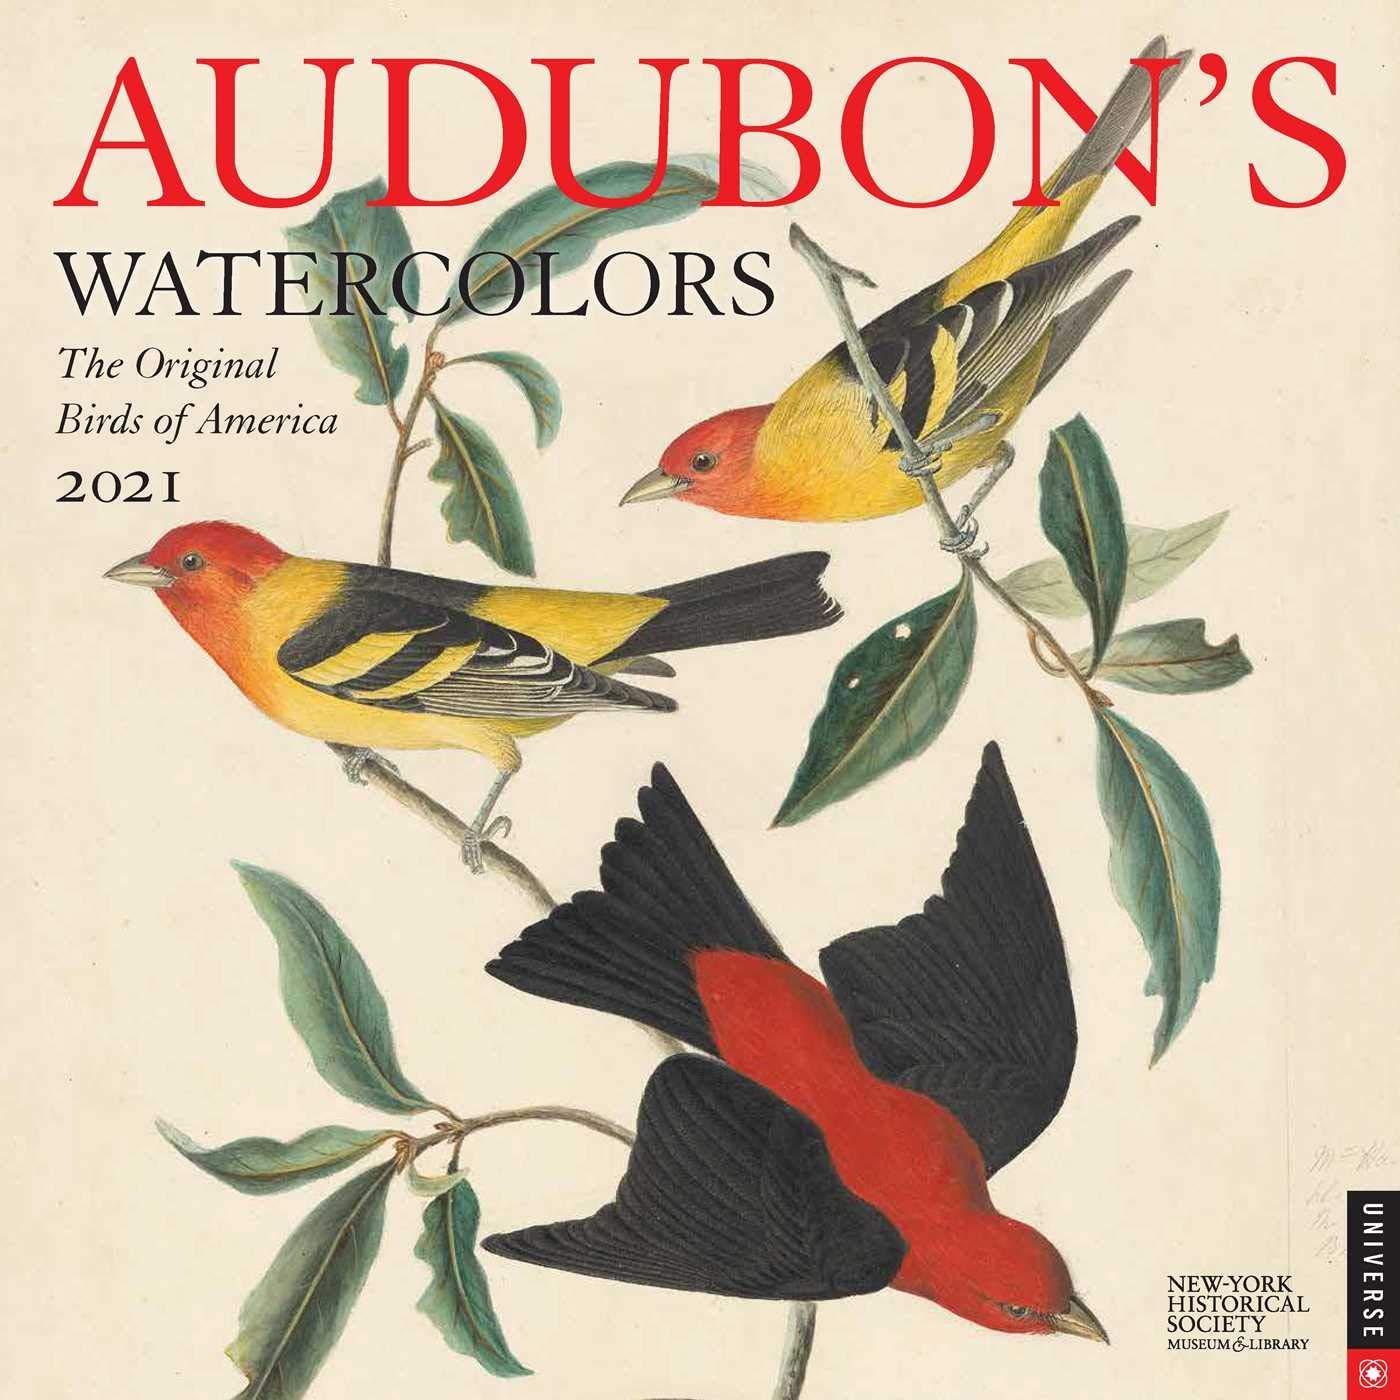 Audubon Bird Calendar 2021 Audubon's Watercolors 2021 Wall Calendar: The Original Birds of